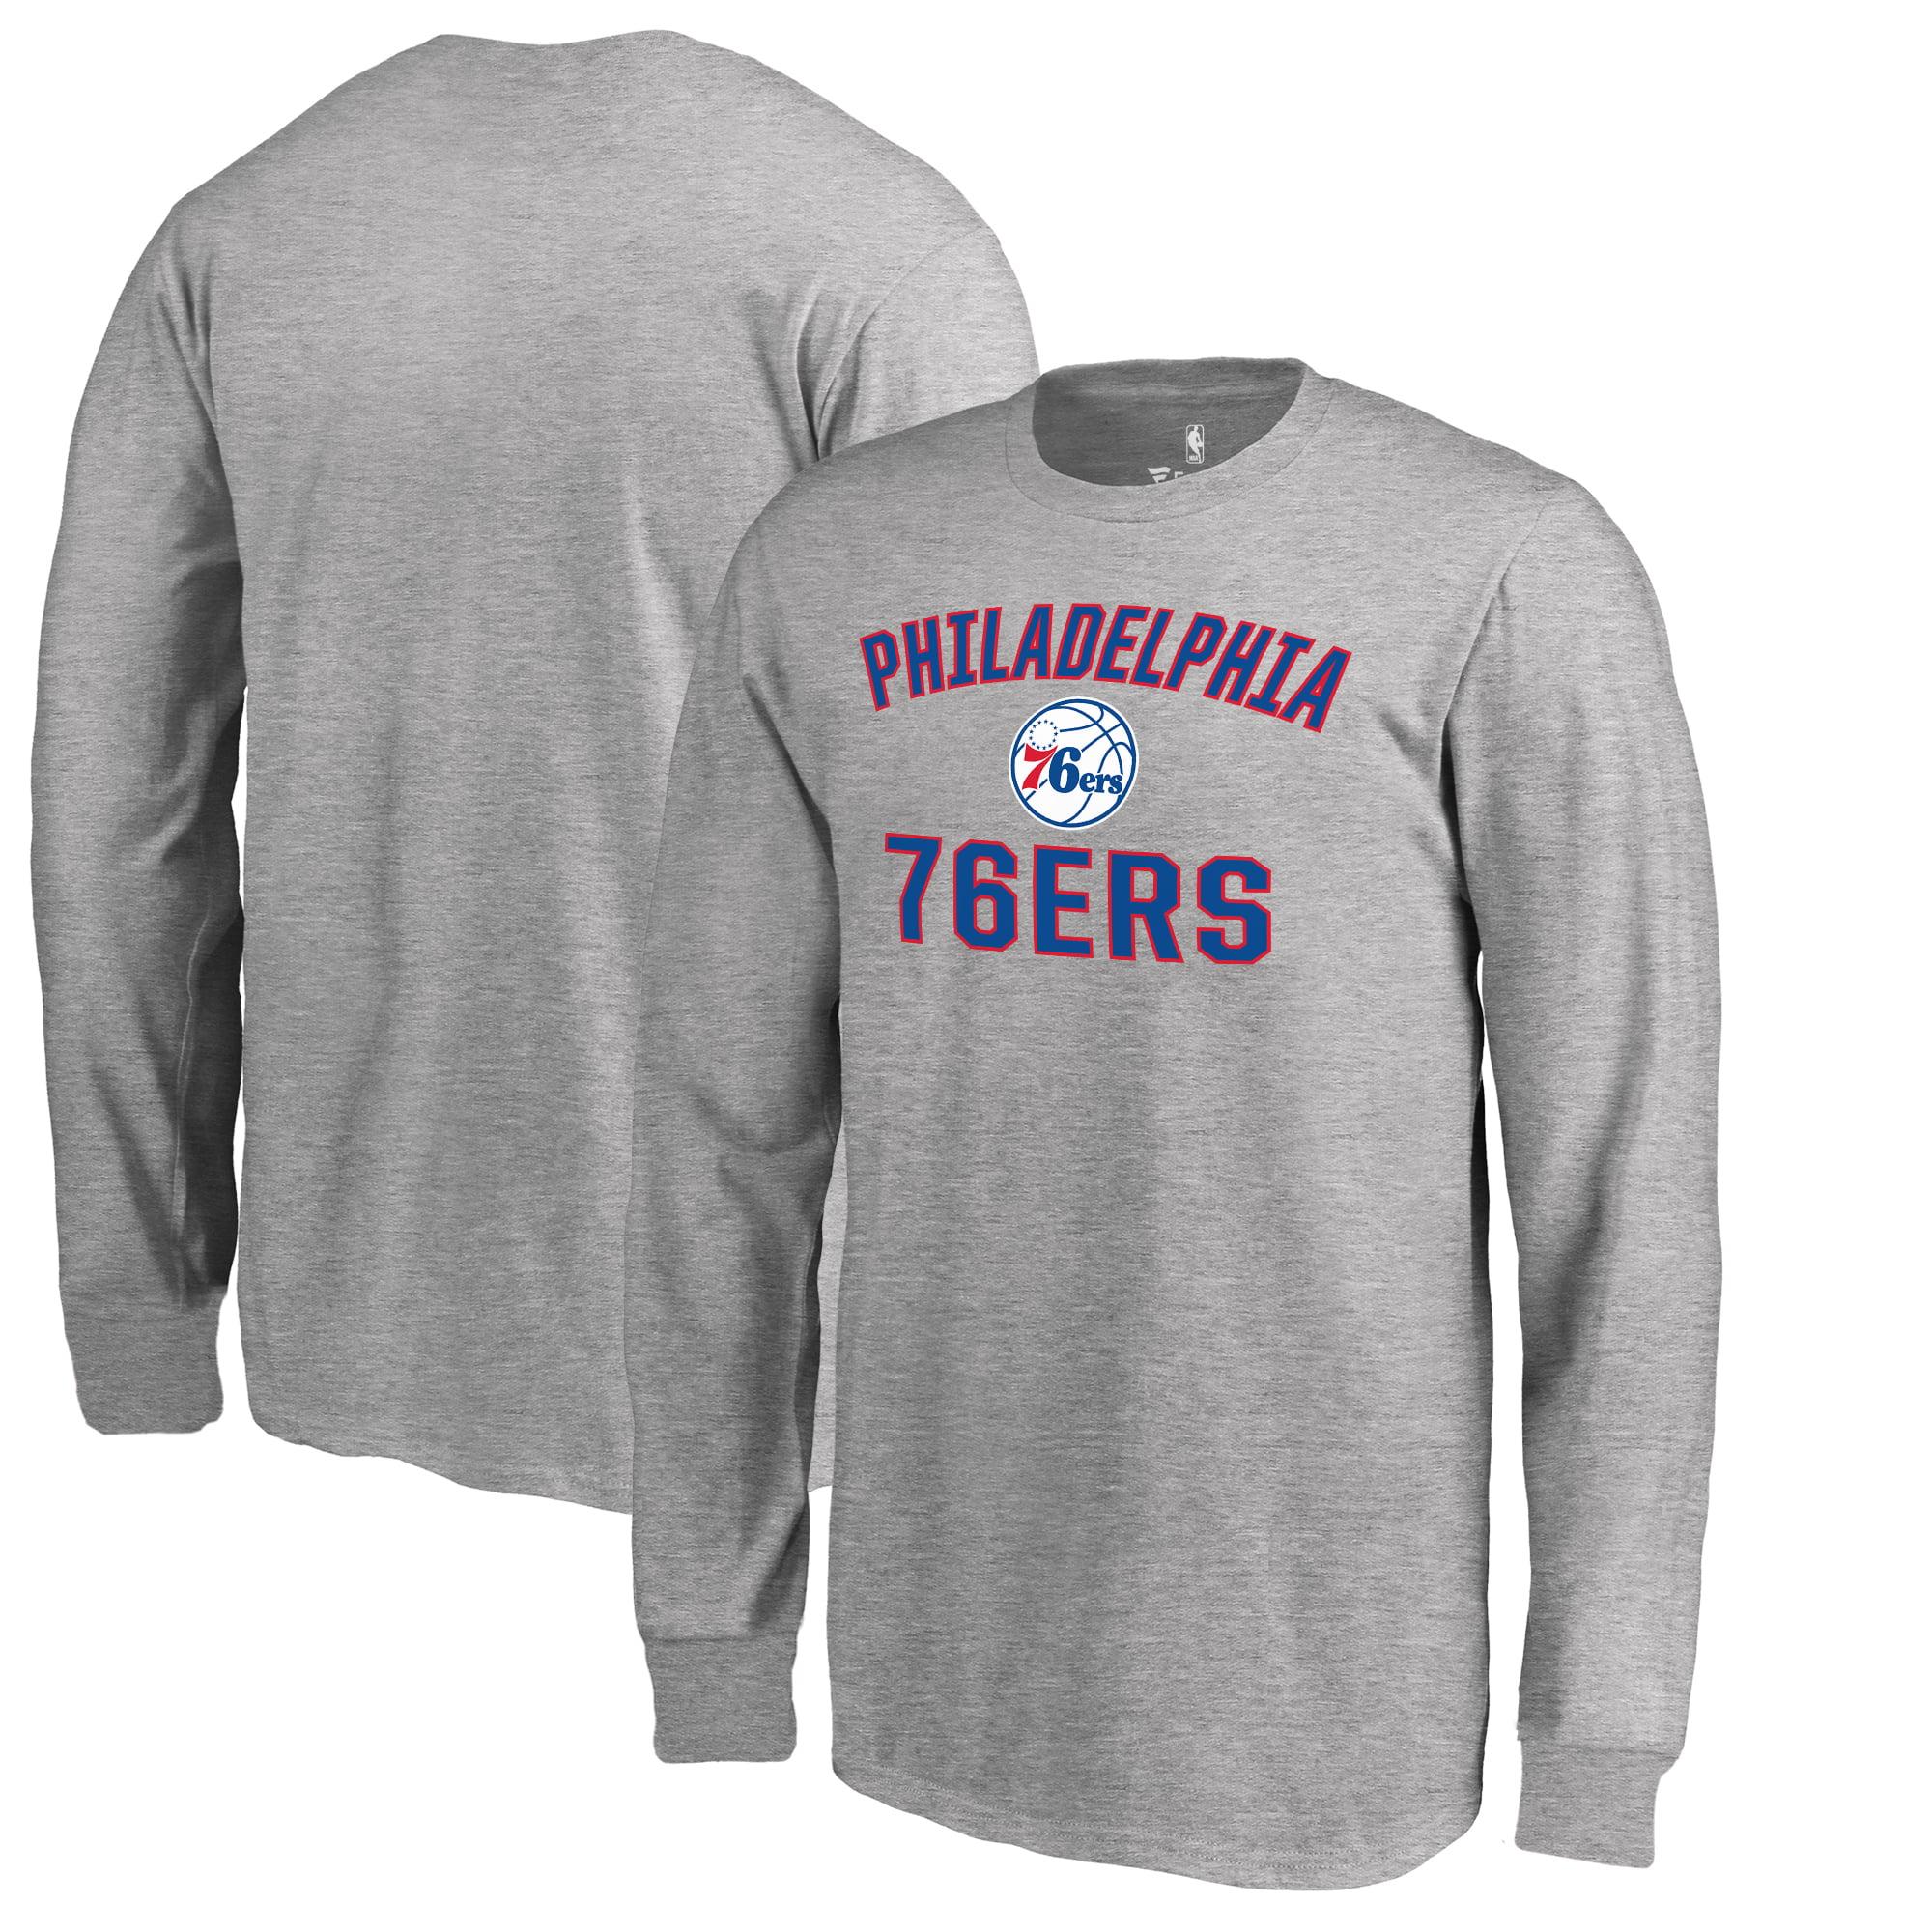 Philadelphia 76ers Fanatics Branded Youth Victory Arch Long Sleeve T-Shirt - Heathered Gray